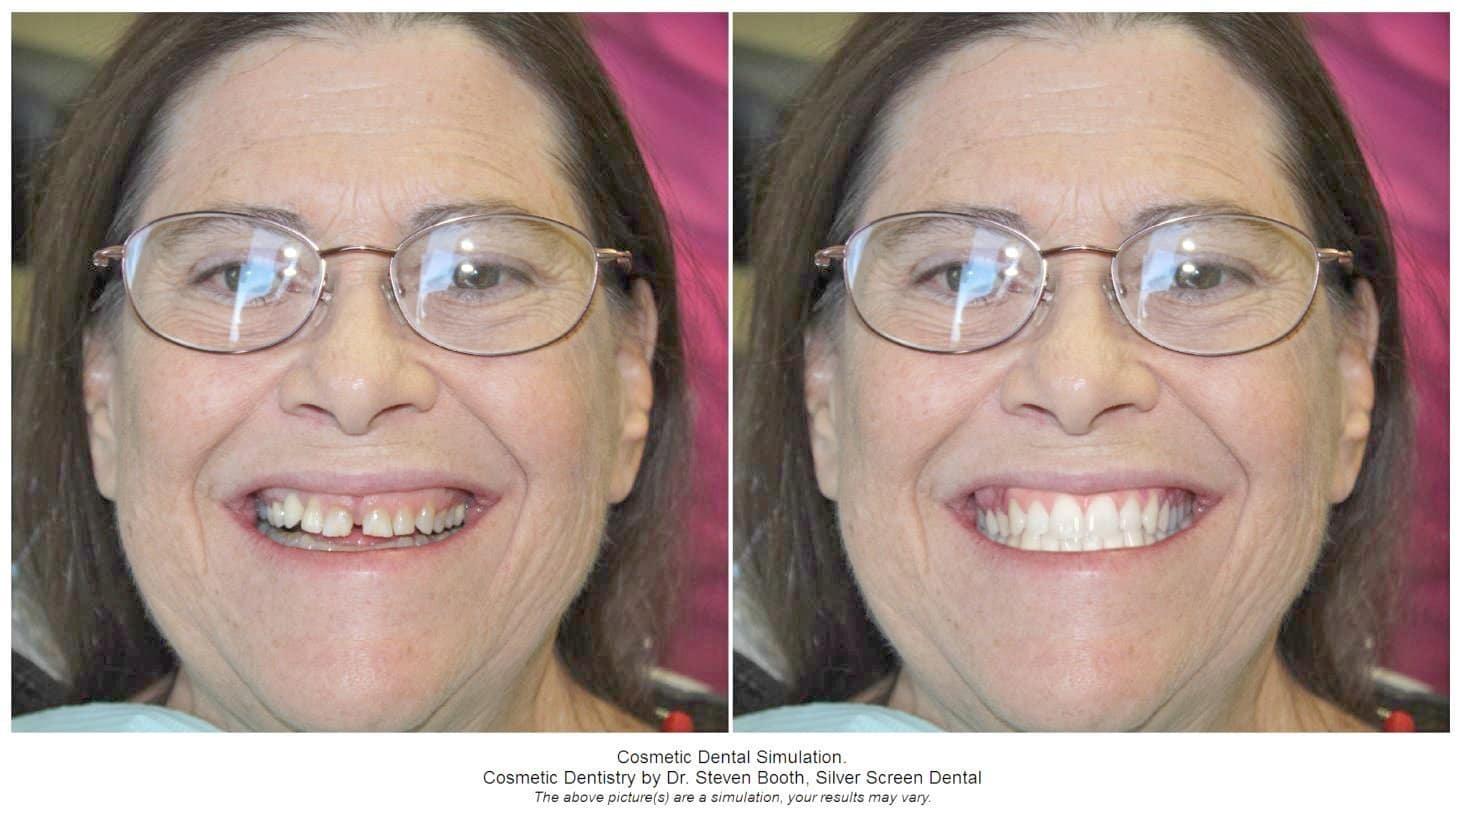 Silver Screen Dental in Austin, TX